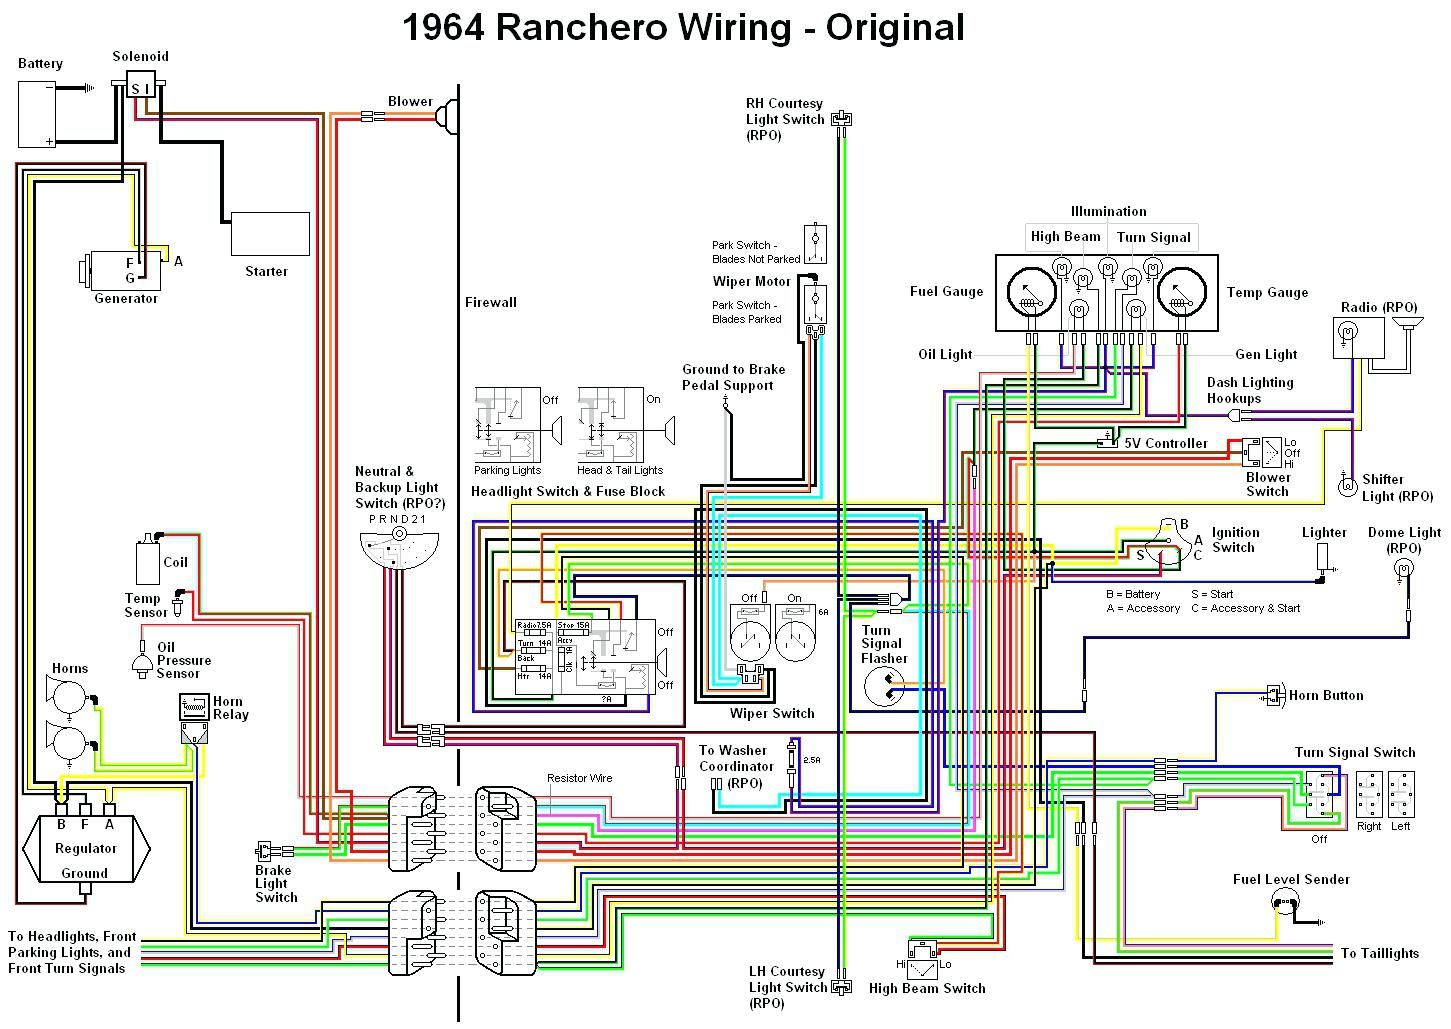 ford ba wiring diagram free wiring diagram ford ba wiring diagram free [ 1451 x 1029 Pixel ]